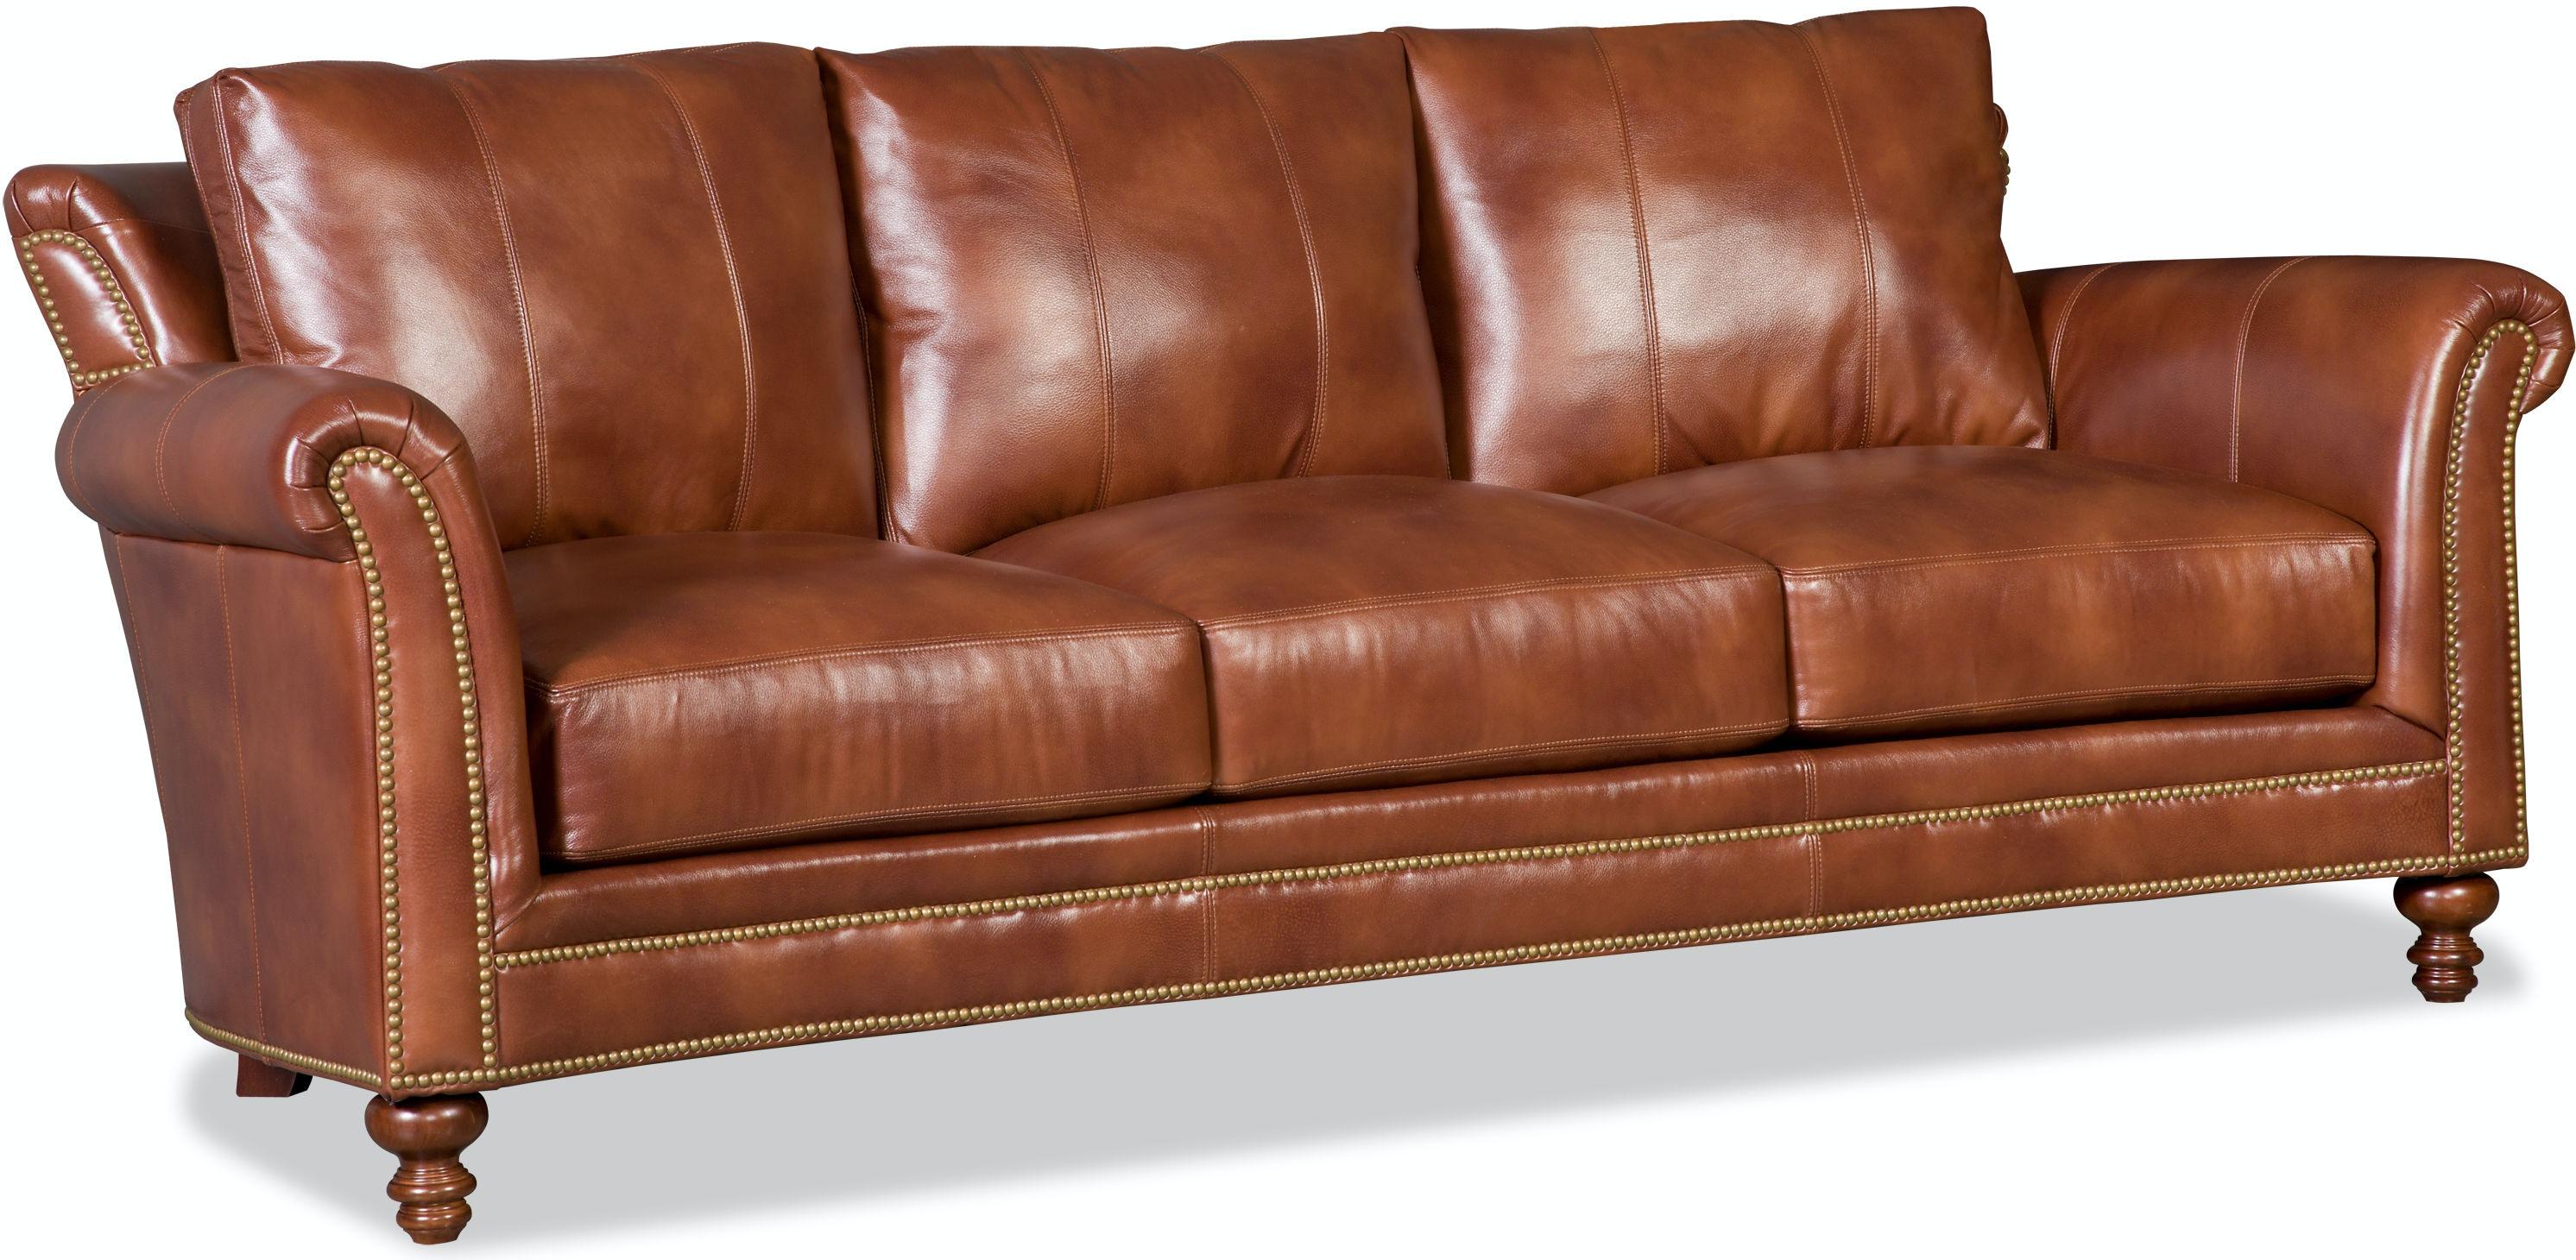 Bradington Young Living Room Richardson Stationary Sofa 8 Way Tie